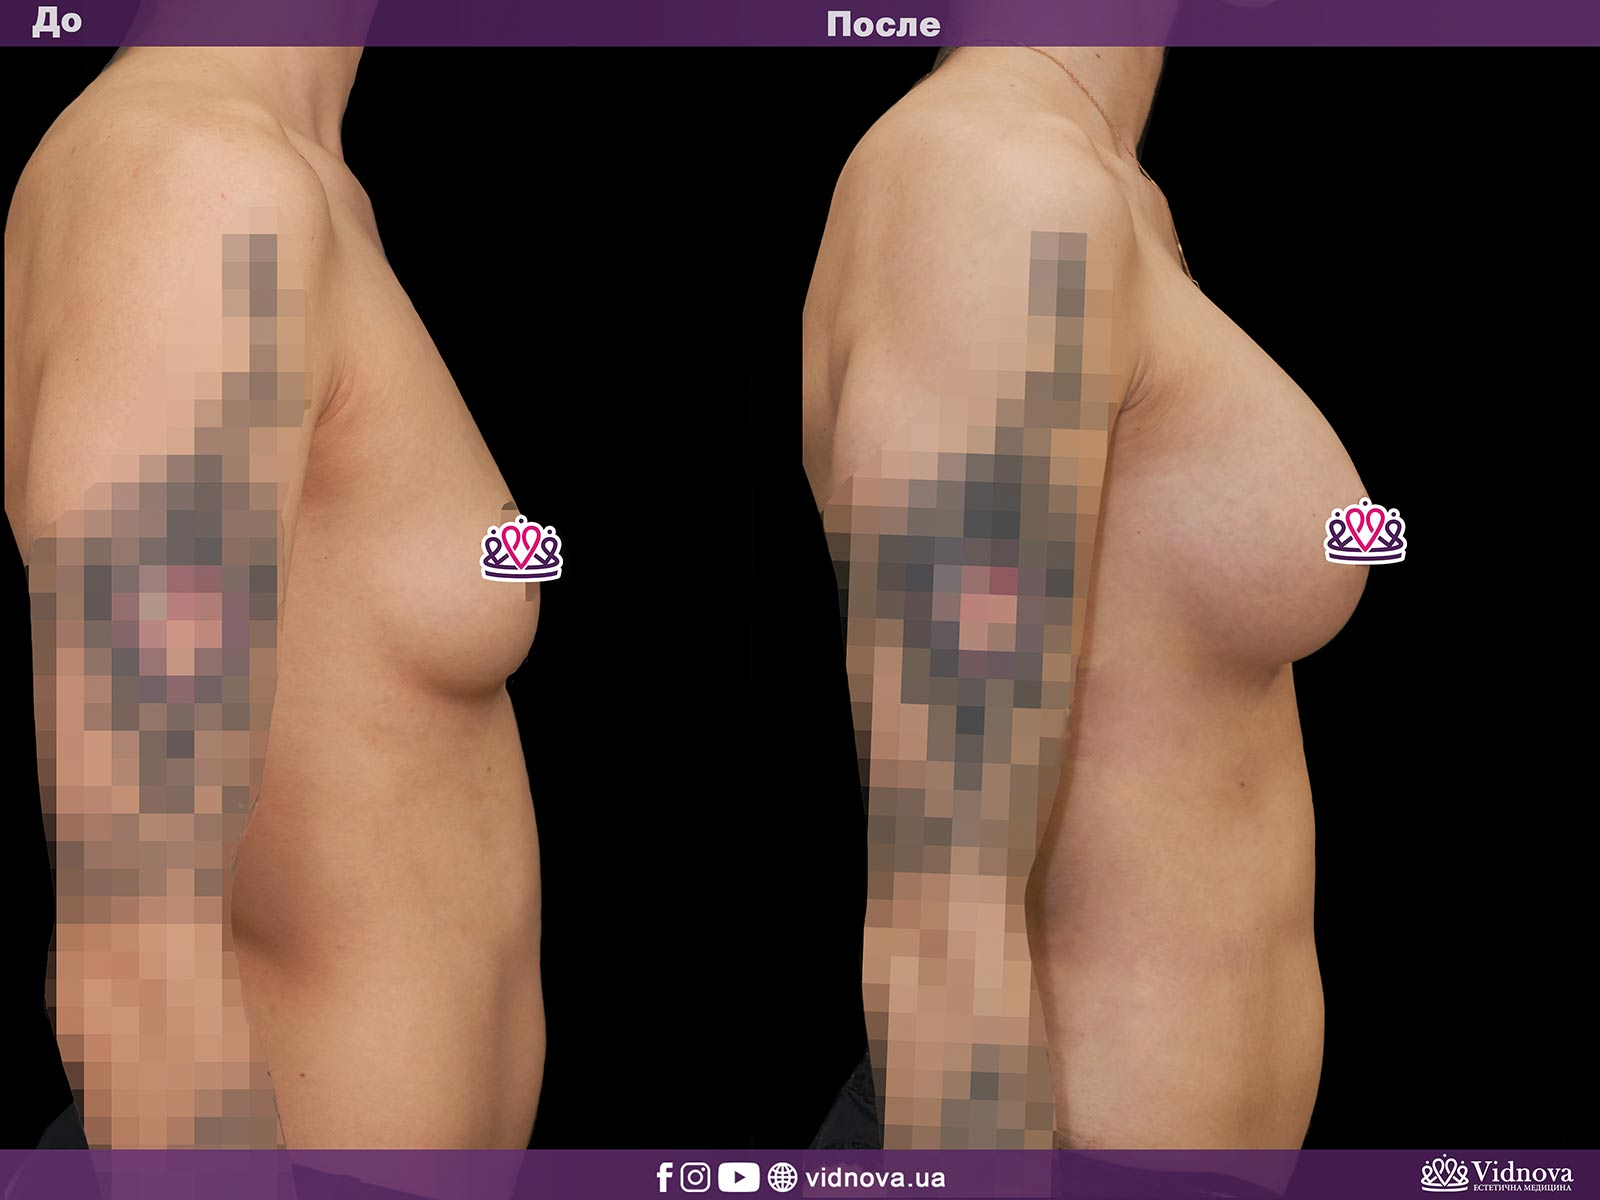 Увеличение груди: Фото ДО и ПОСЛЕ - Пример №7-3 - Клиника Vidnova